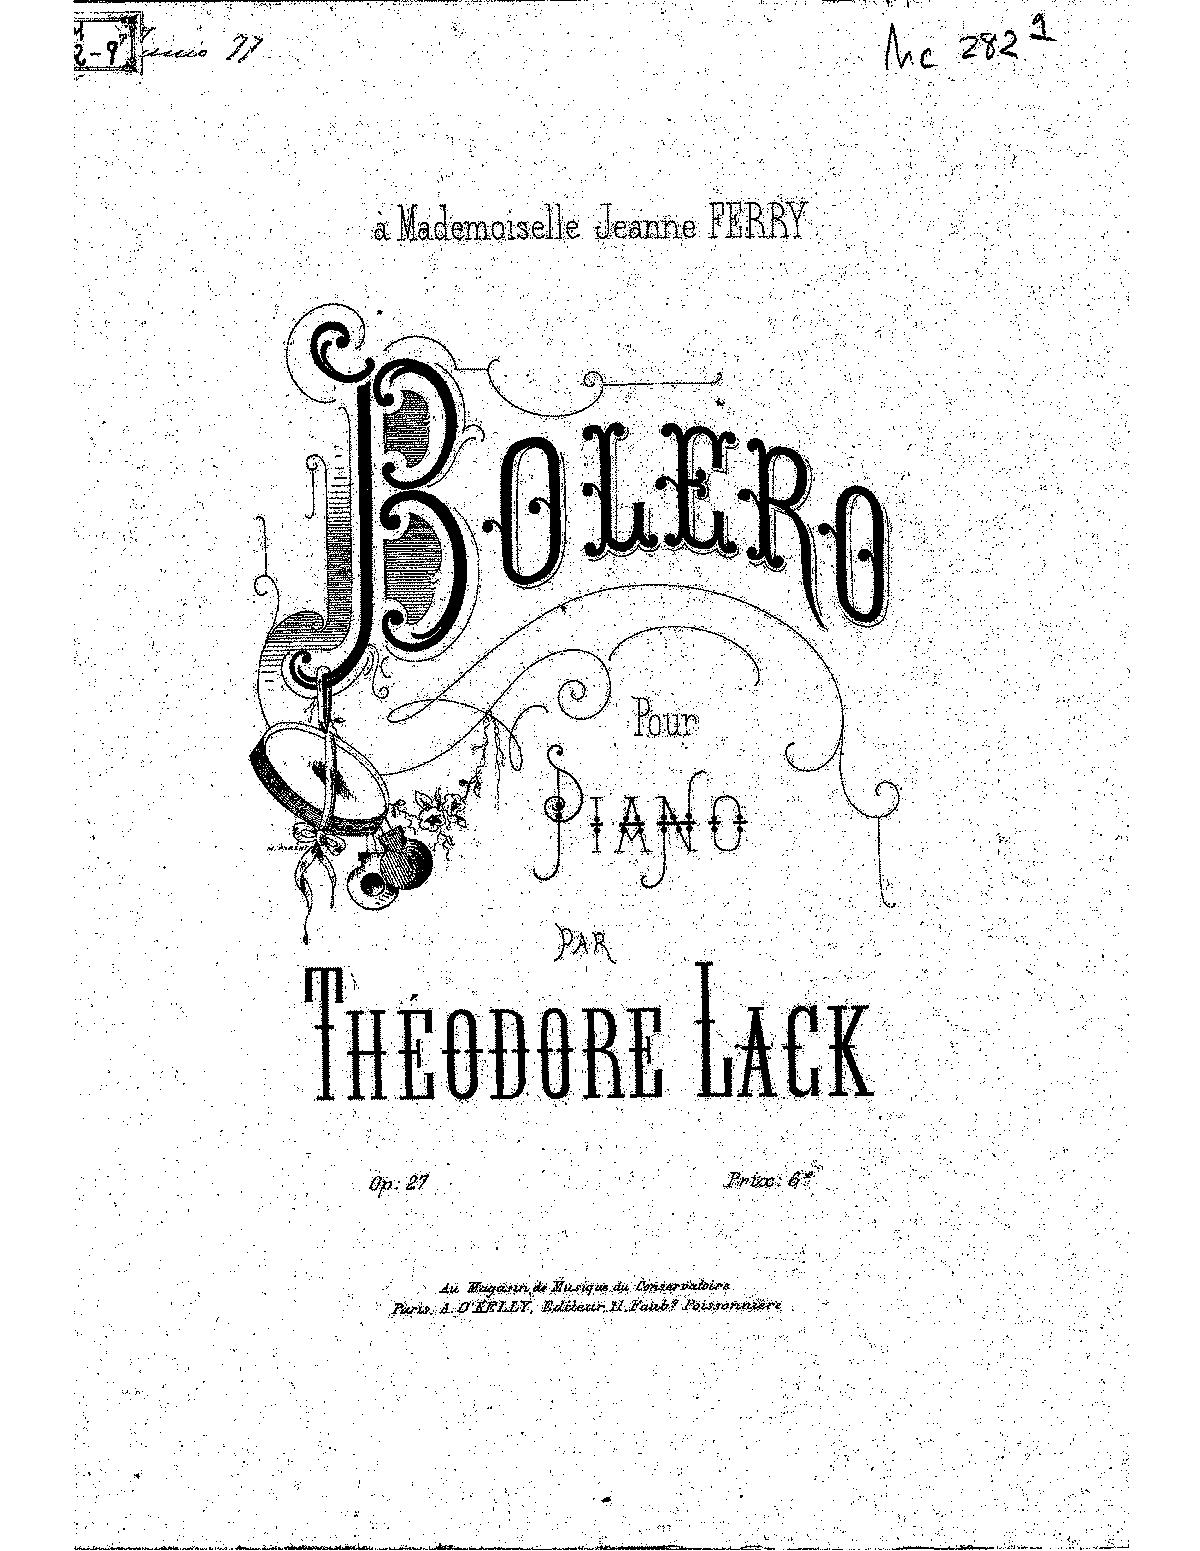 Boléro, Op.27 (Lack, Théodore) - IMSLP/Petrucci Music ... Theodore Lack